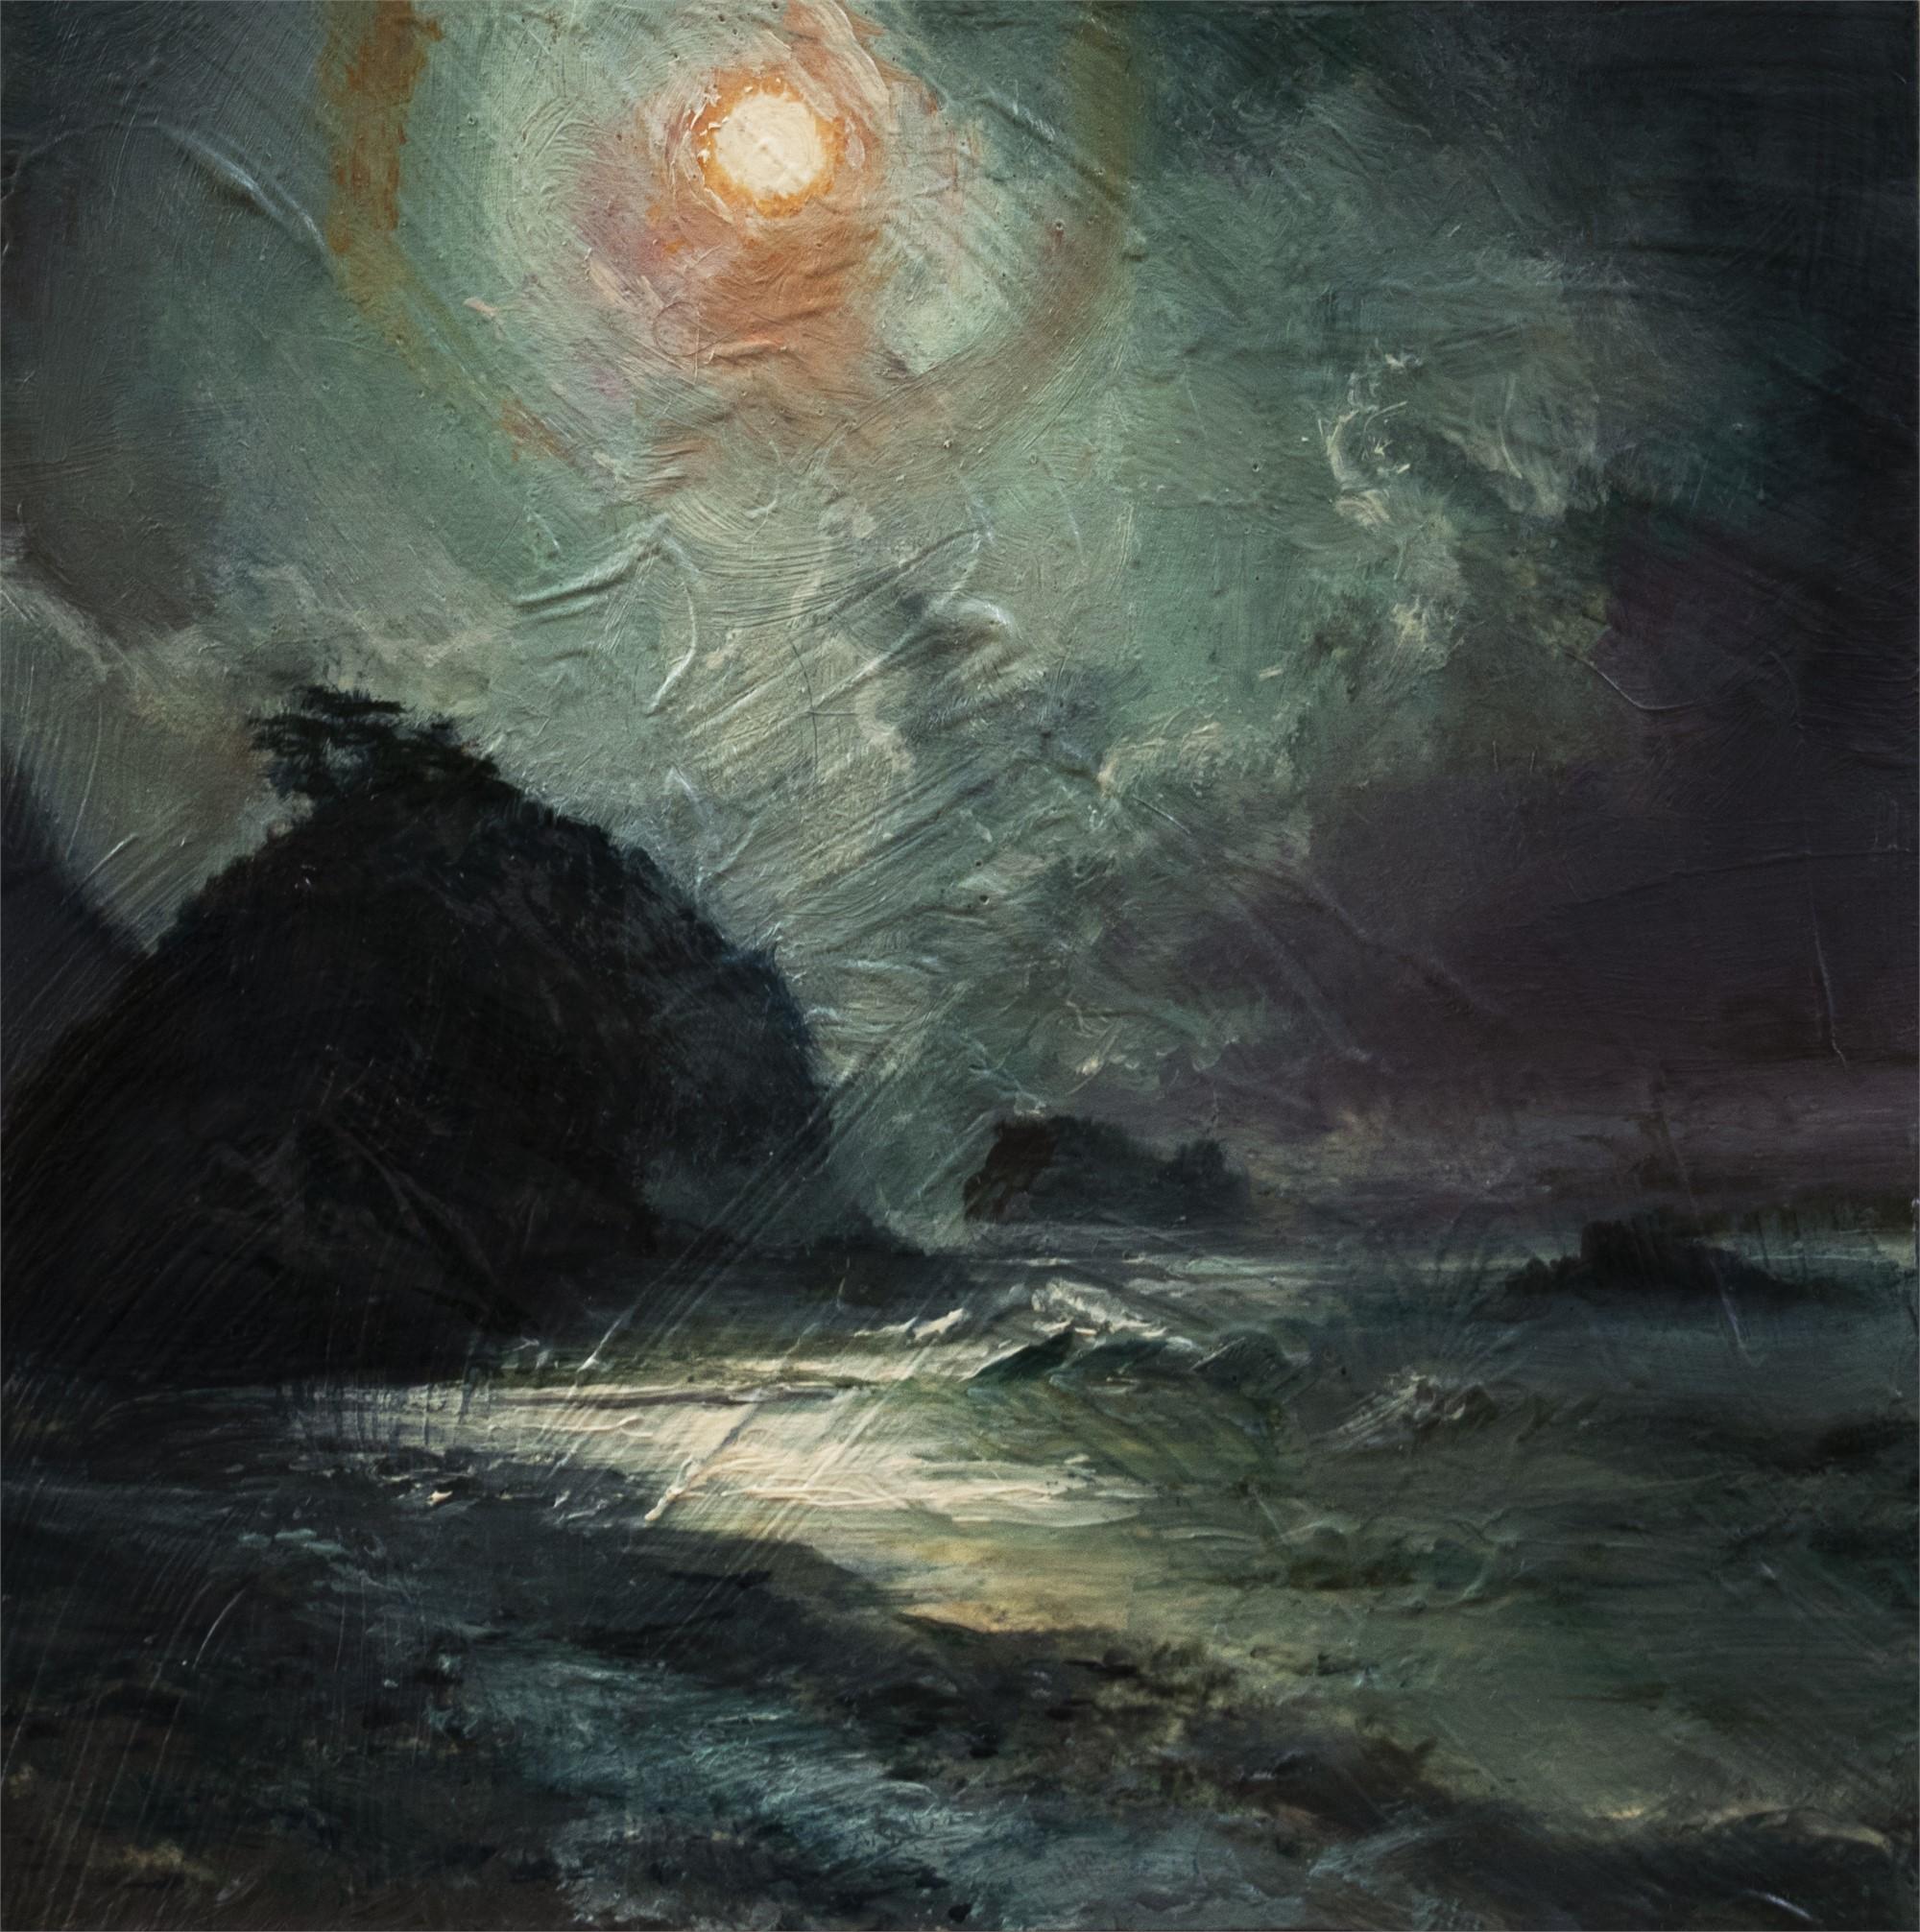 Edge by Adam Burke